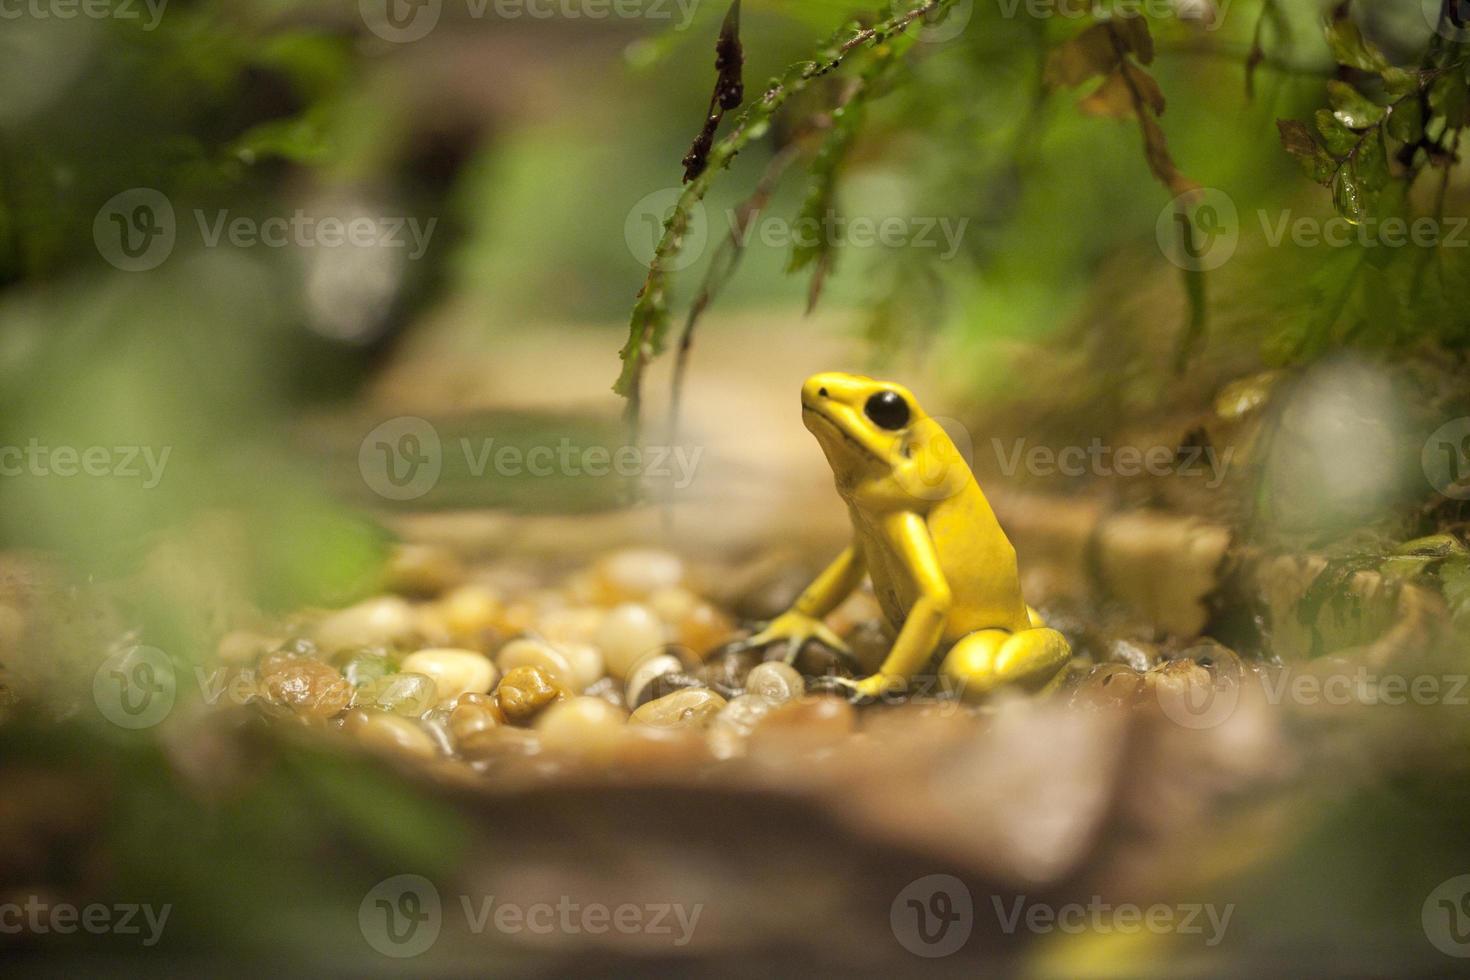 grenouille venimeuse dorée - phyllobates terribilis photo